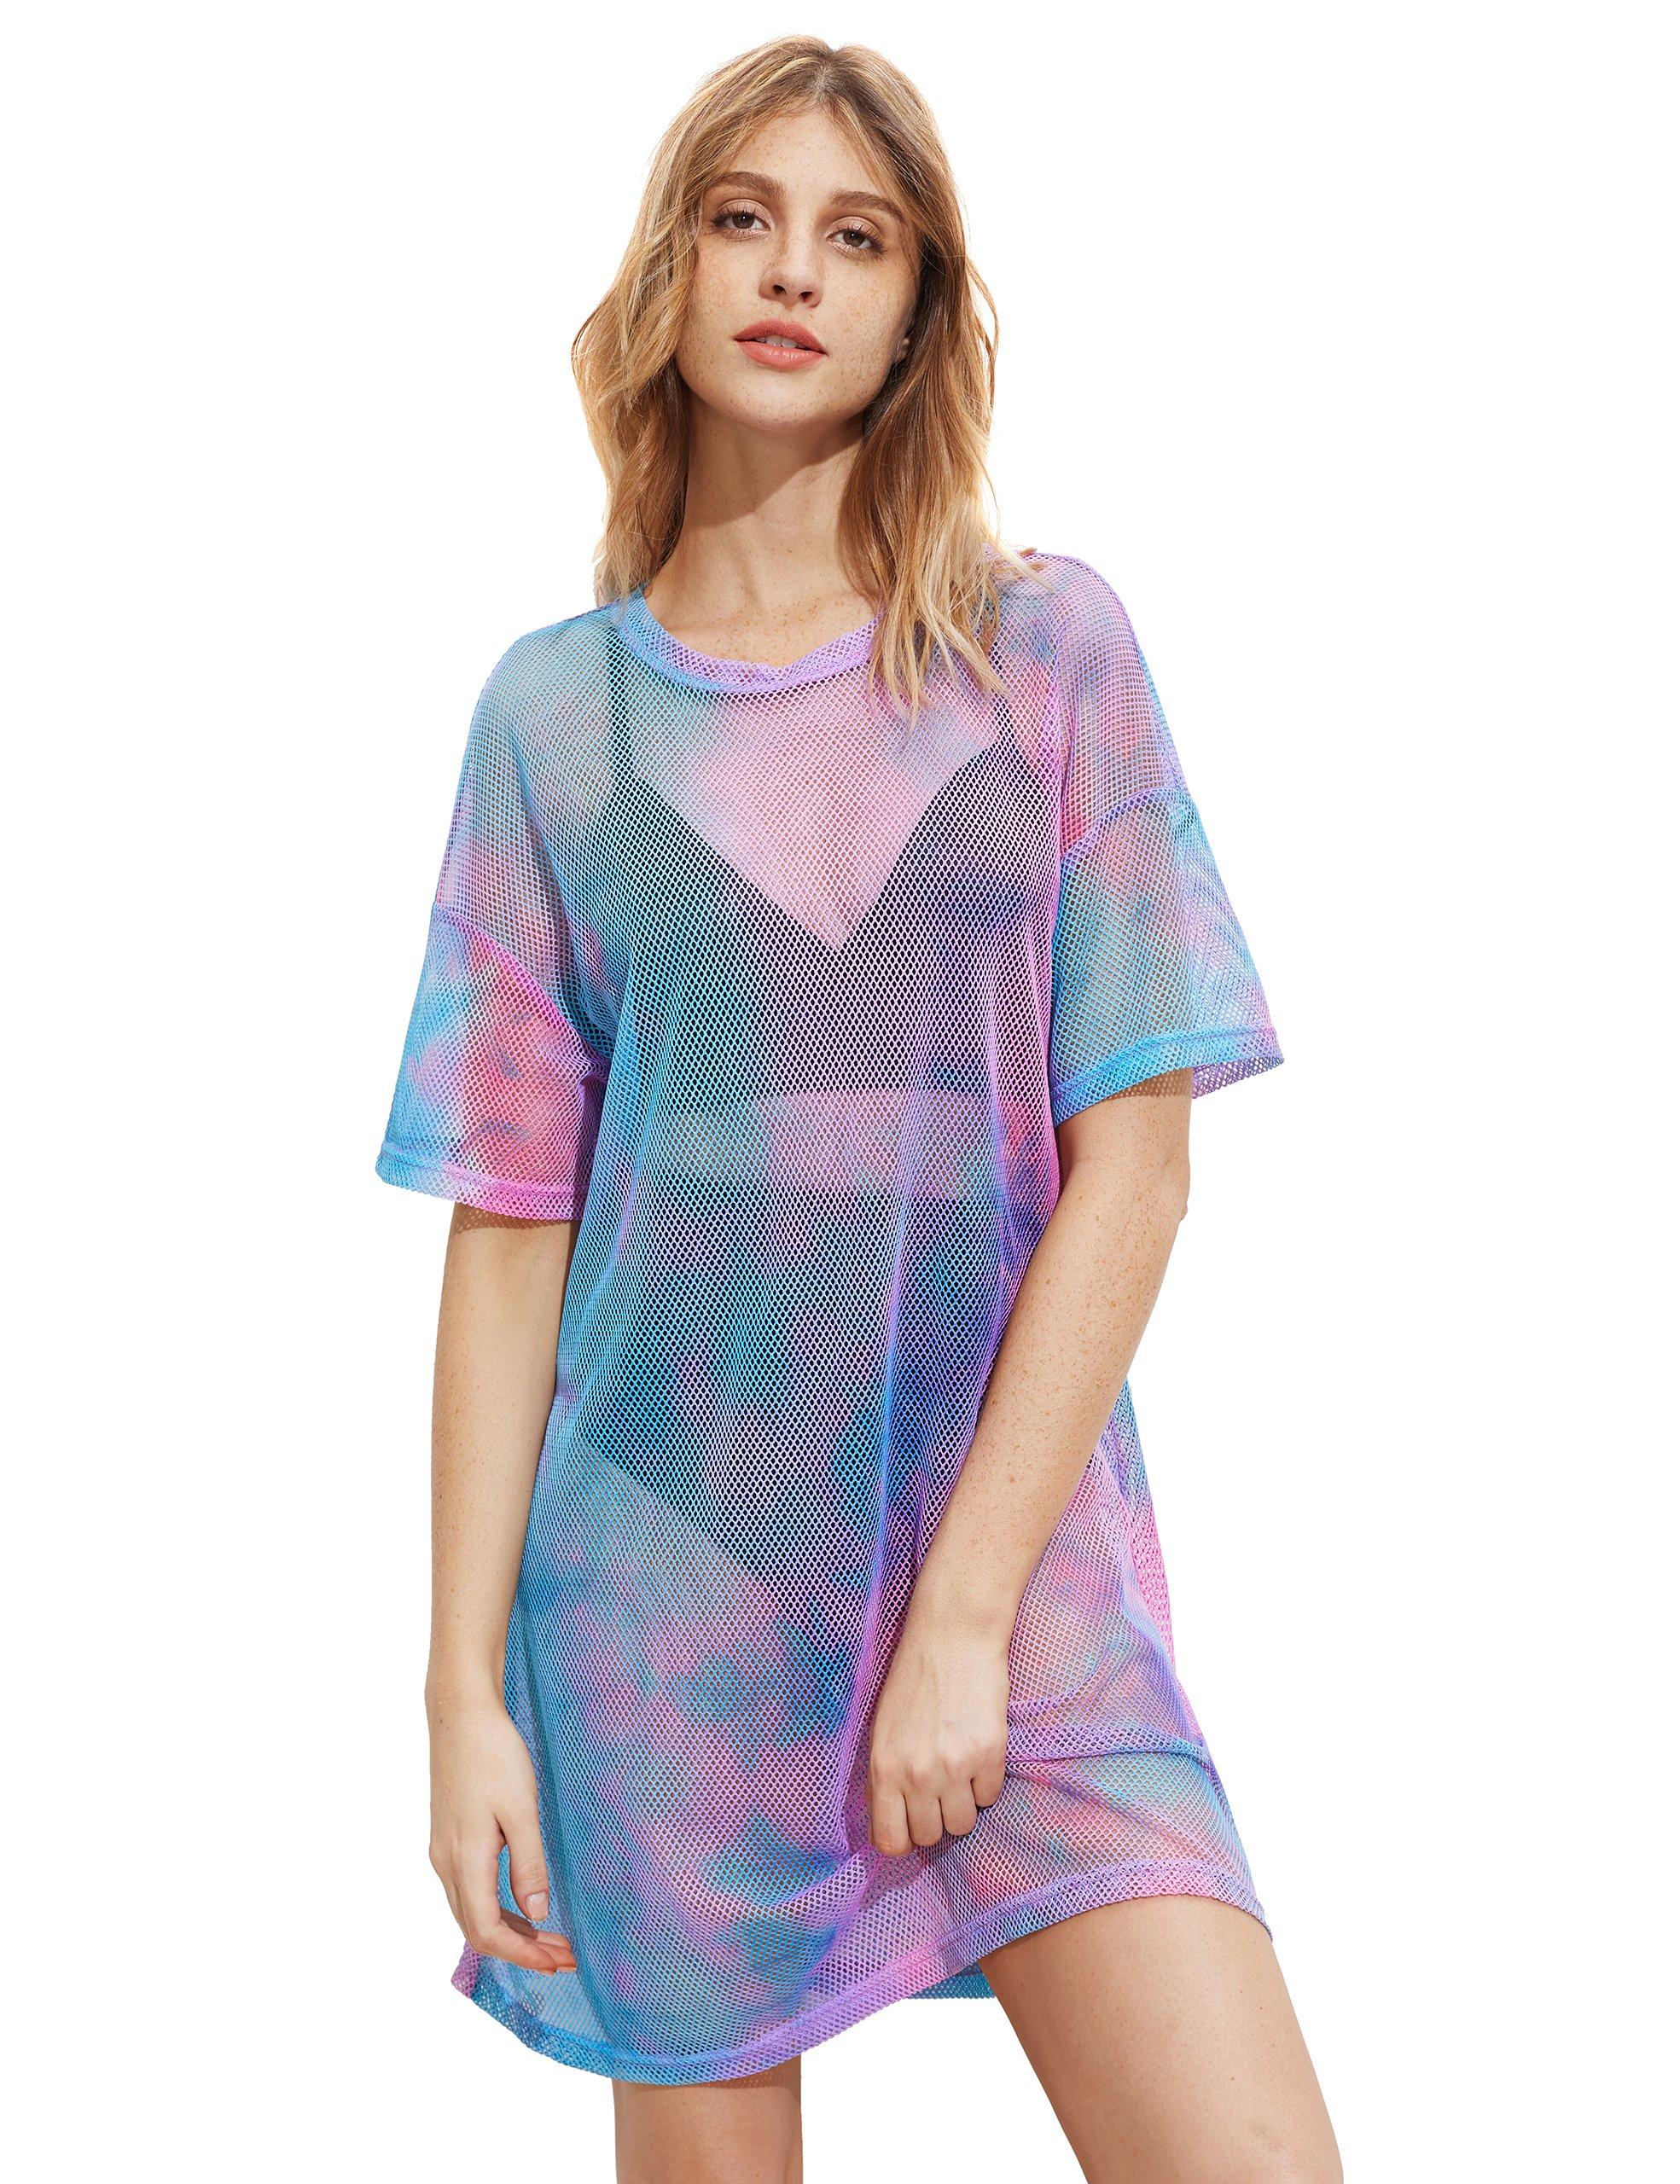 MakeMeChic Women's Short Sleeve See Through Sheer Mesh T Shirt Dress Multicolored L